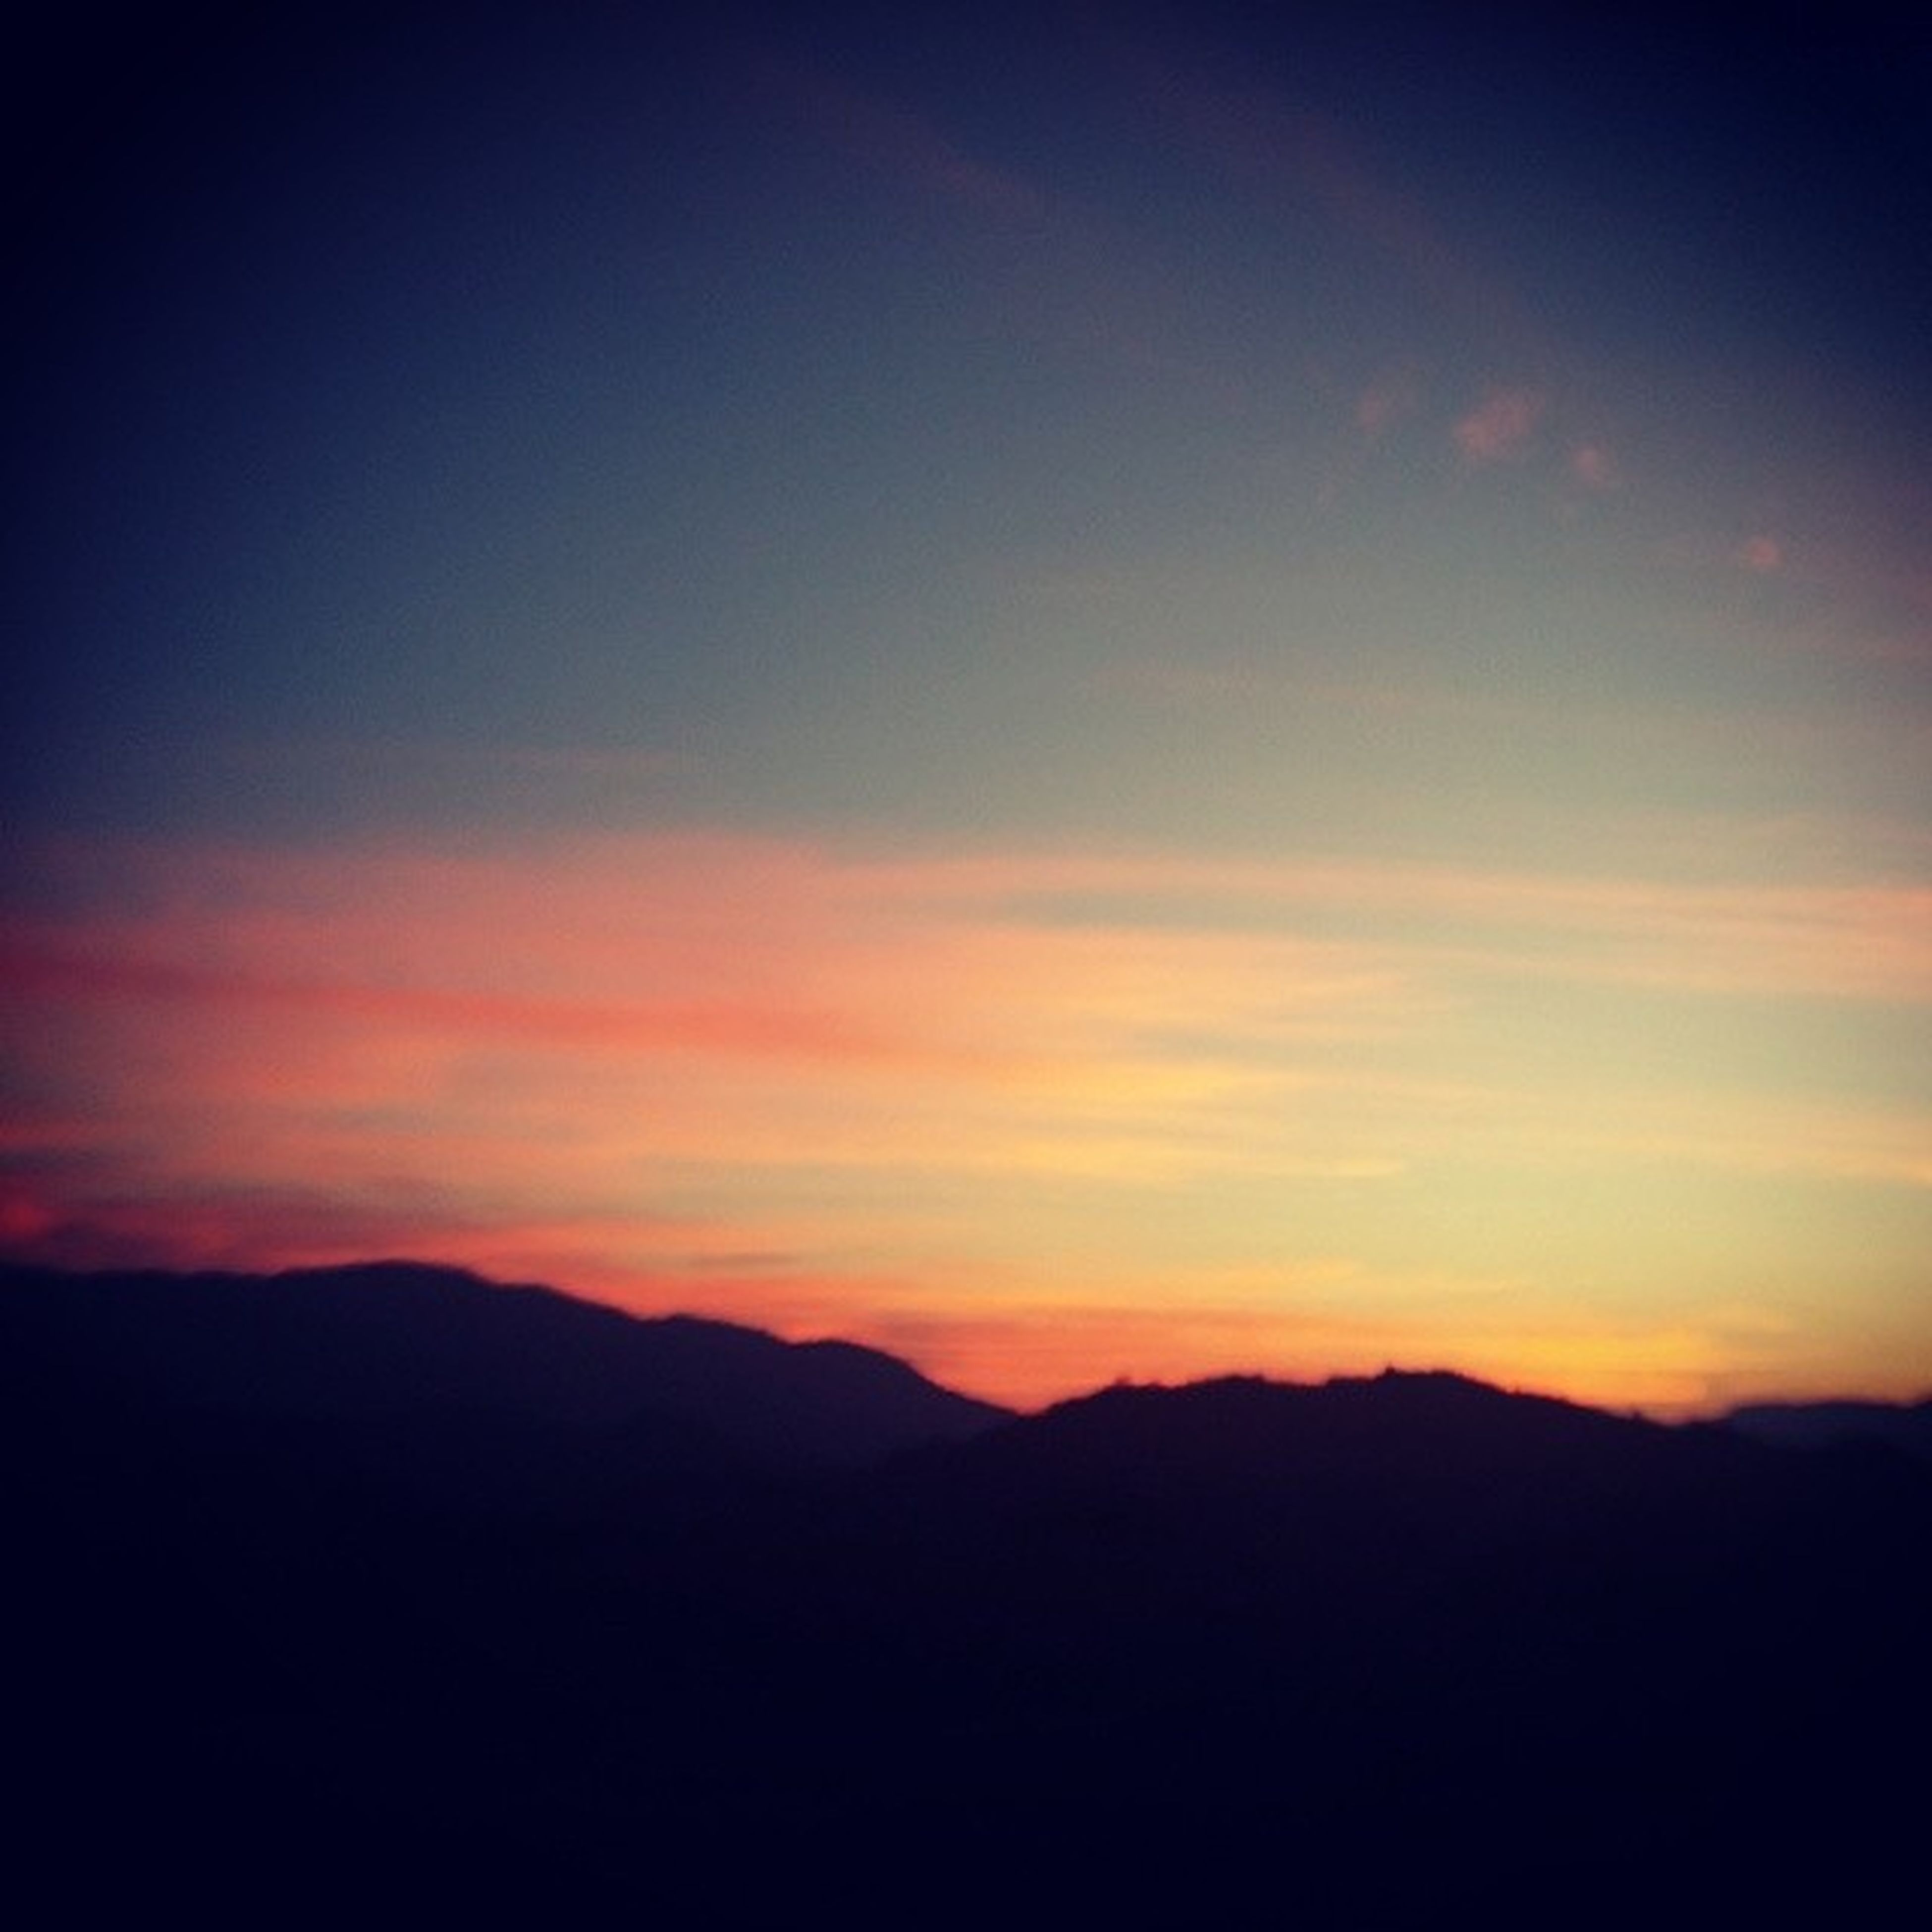 silhouette, sunset, scenics, tranquil scene, tranquility, beauty in nature, mountain, sky, mountain range, nature, idyllic, landscape, orange color, dusk, majestic, copy space, dark, cloud - sky, cloud, non-urban scene